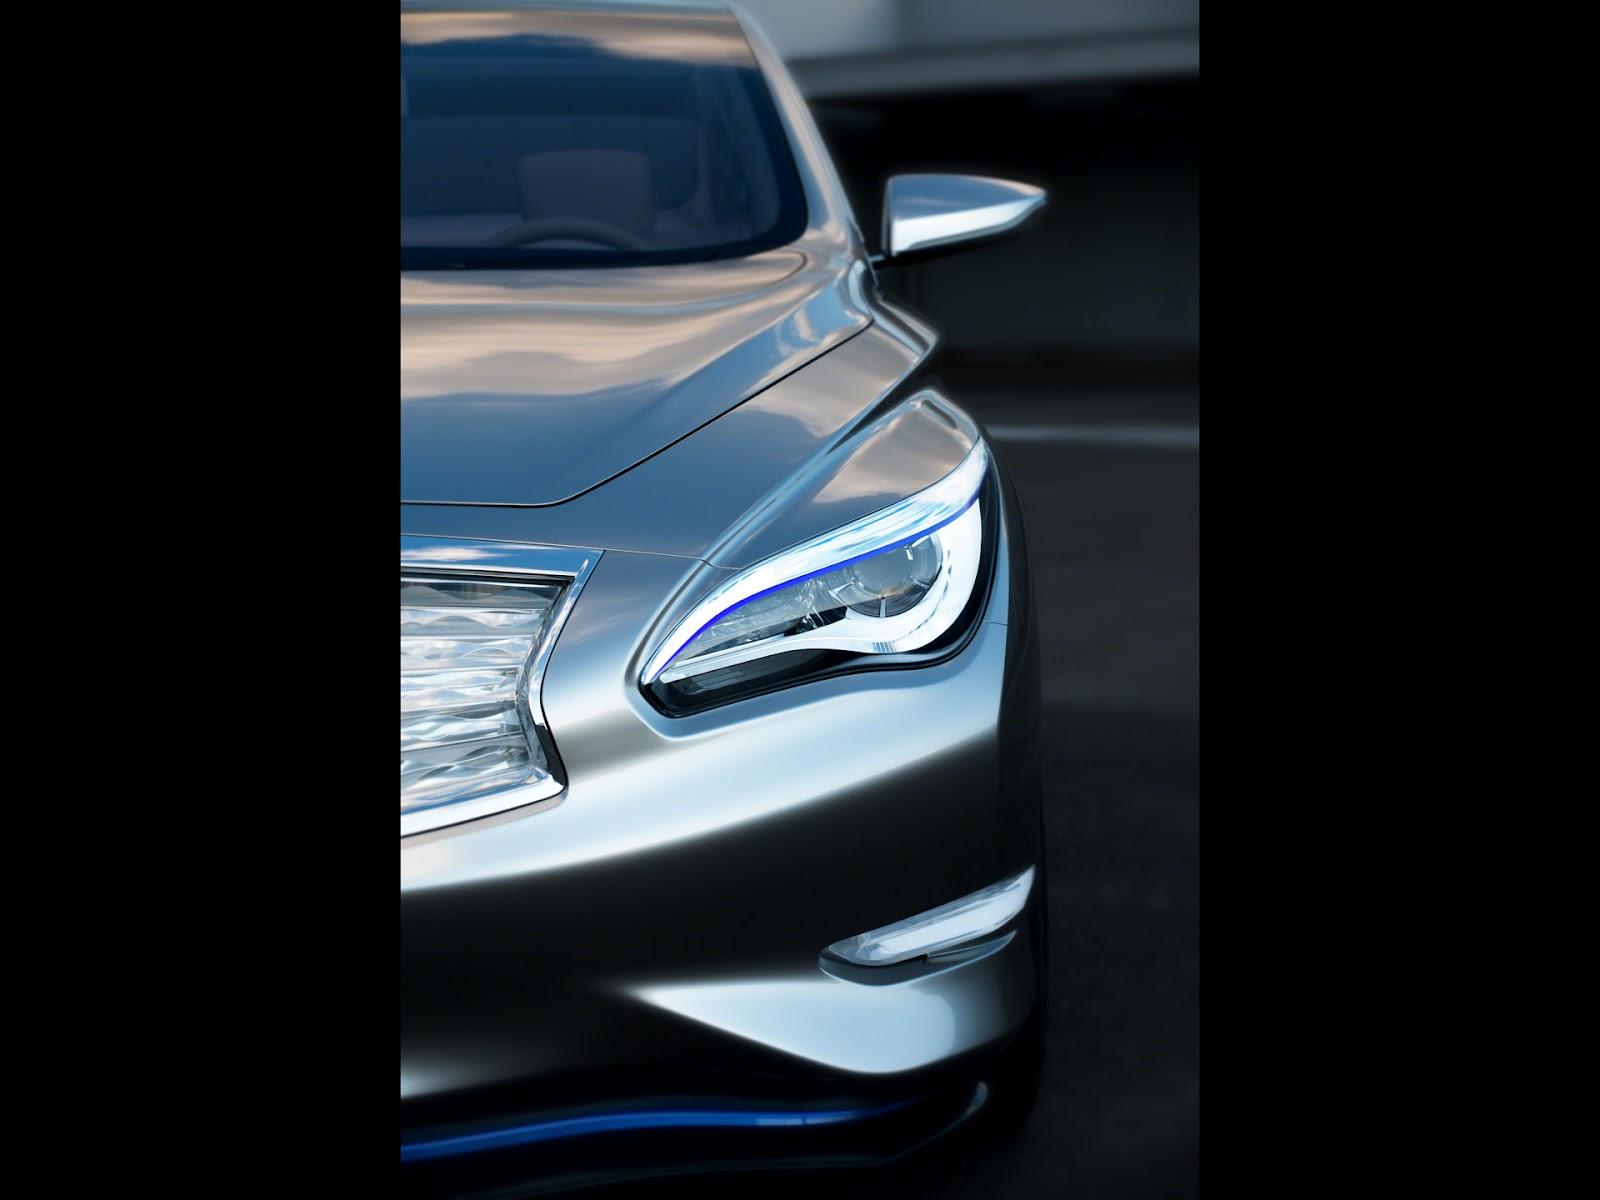 2012 infiniti le concept zero emission luxury sedan news hot car 2012 le concept headlight vanachro Image collections